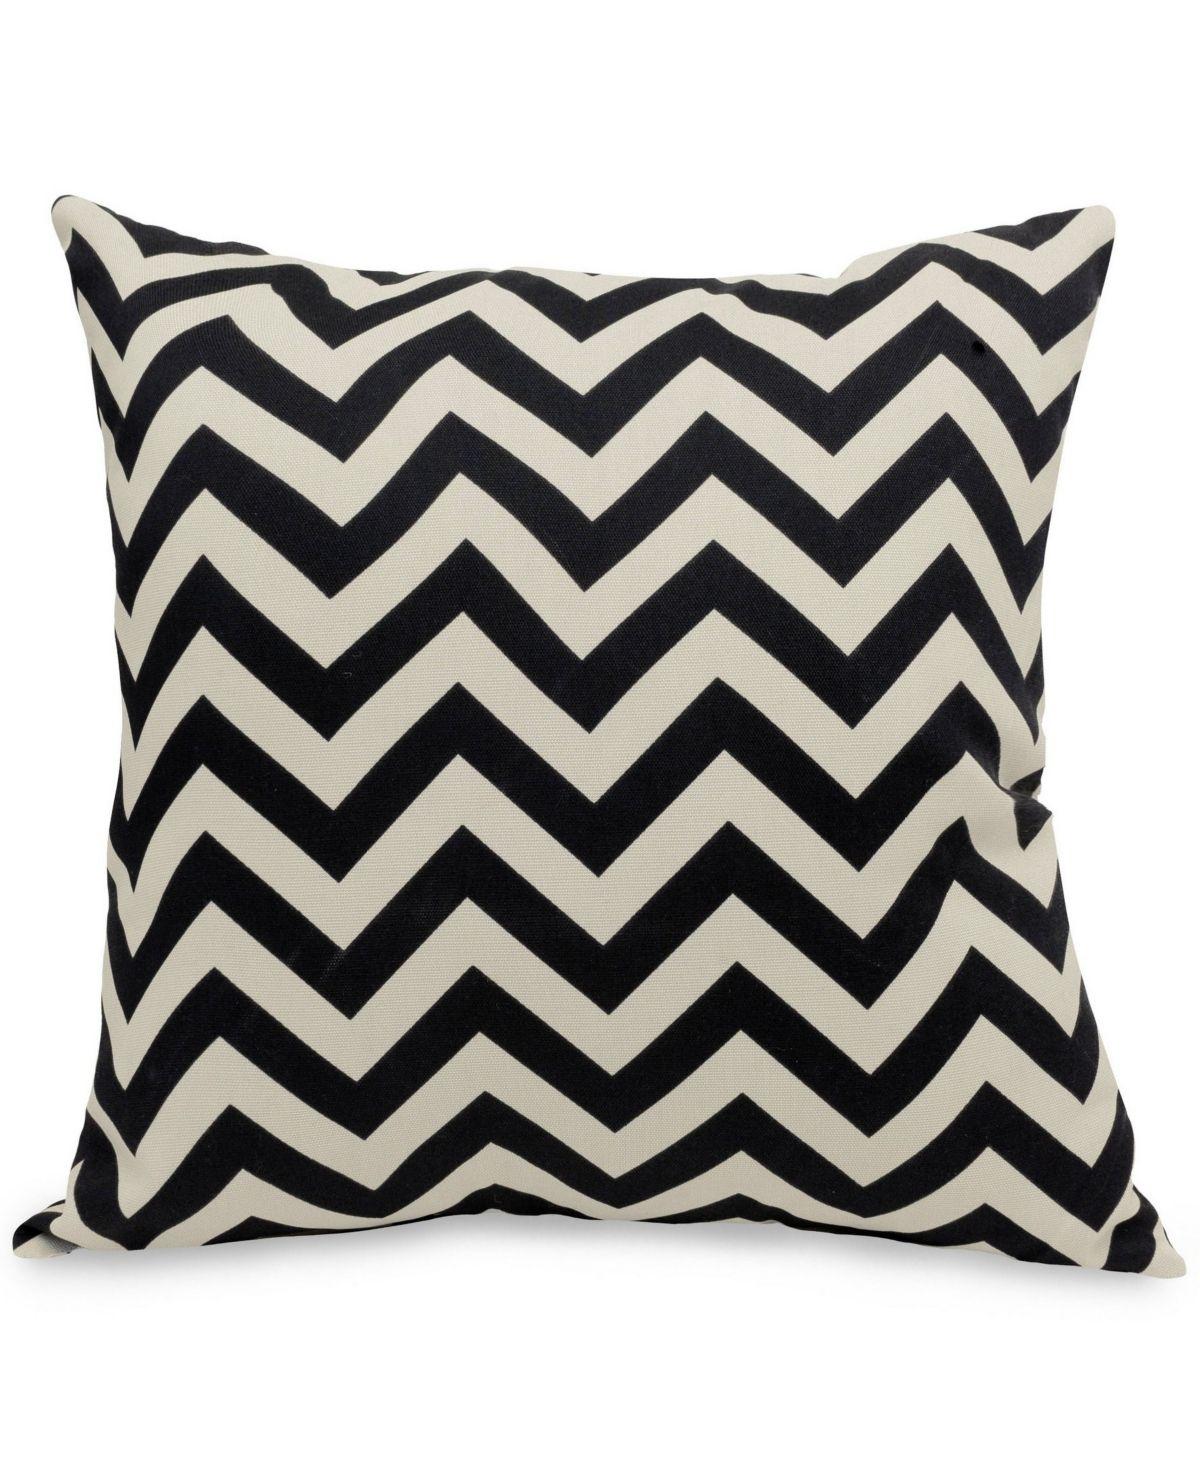 Majestic Home Goods Chevron Decorative Soft Throw Pillow Large 20 X 20 Black Pillows Throw Pillows Soft Throw Pillows Extra large throw pillows